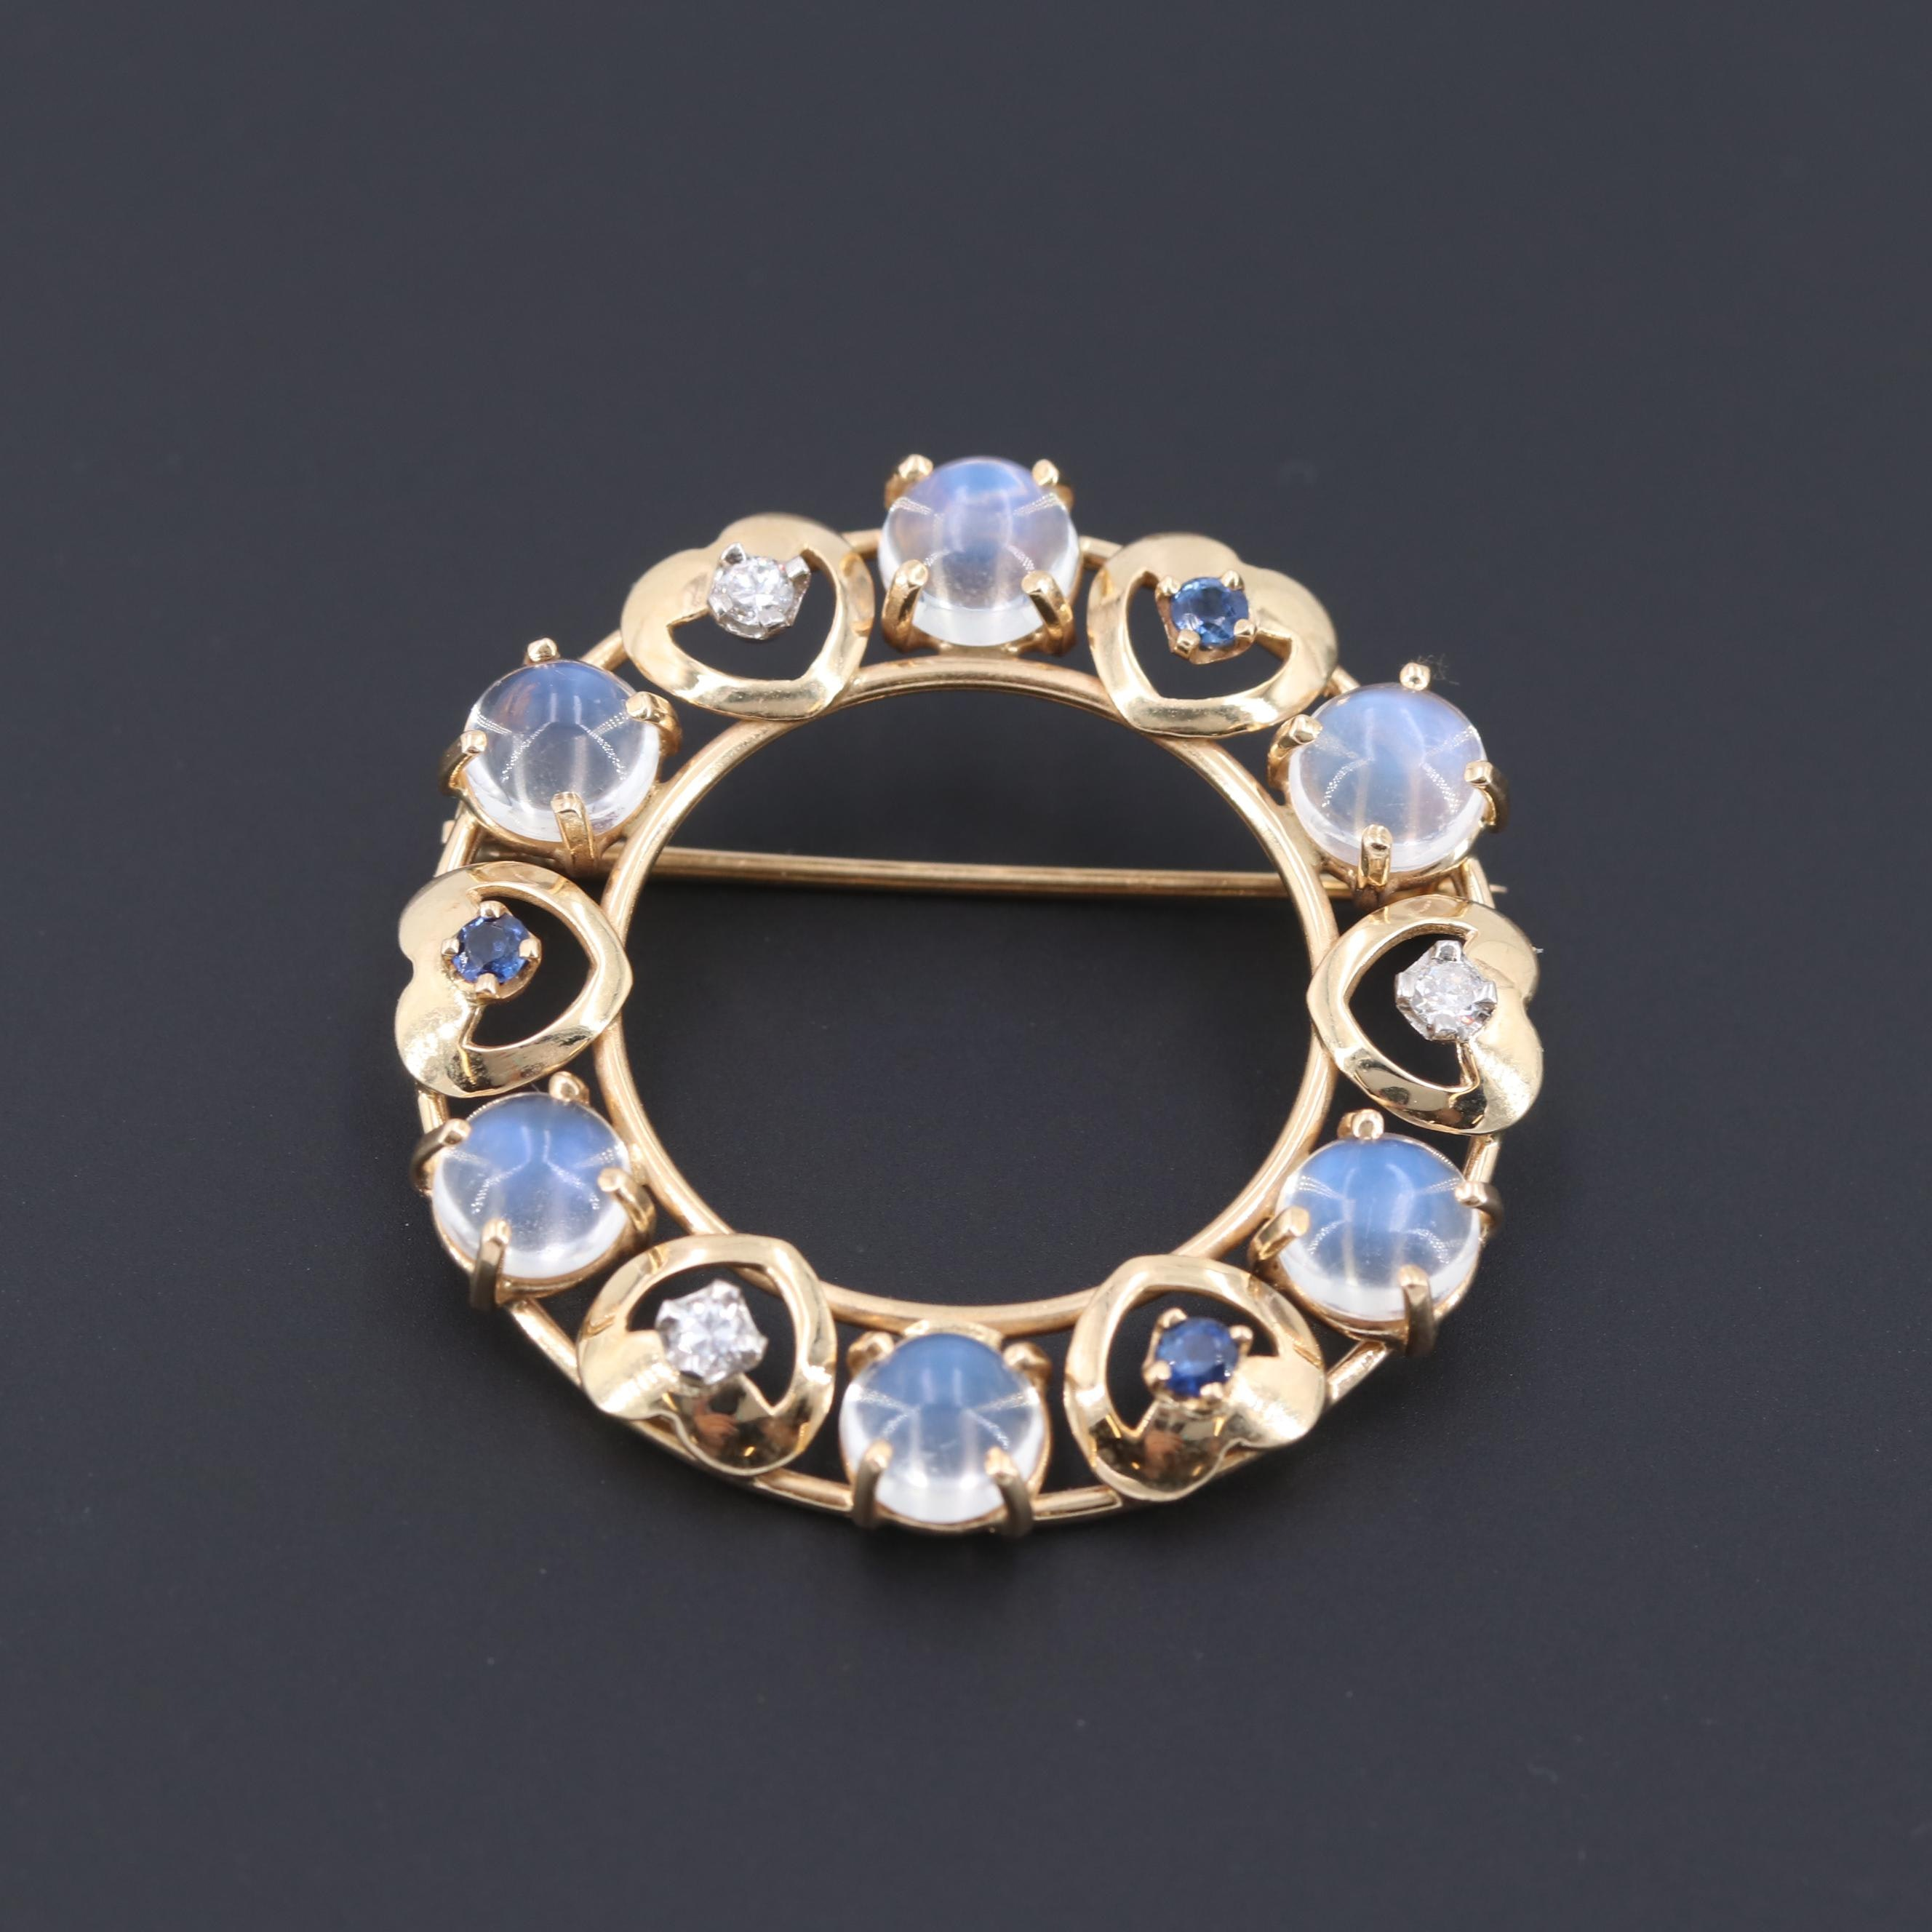 Vintage 14K Yellow Gold Moonstone, Diamond, and Sapphire Brooch